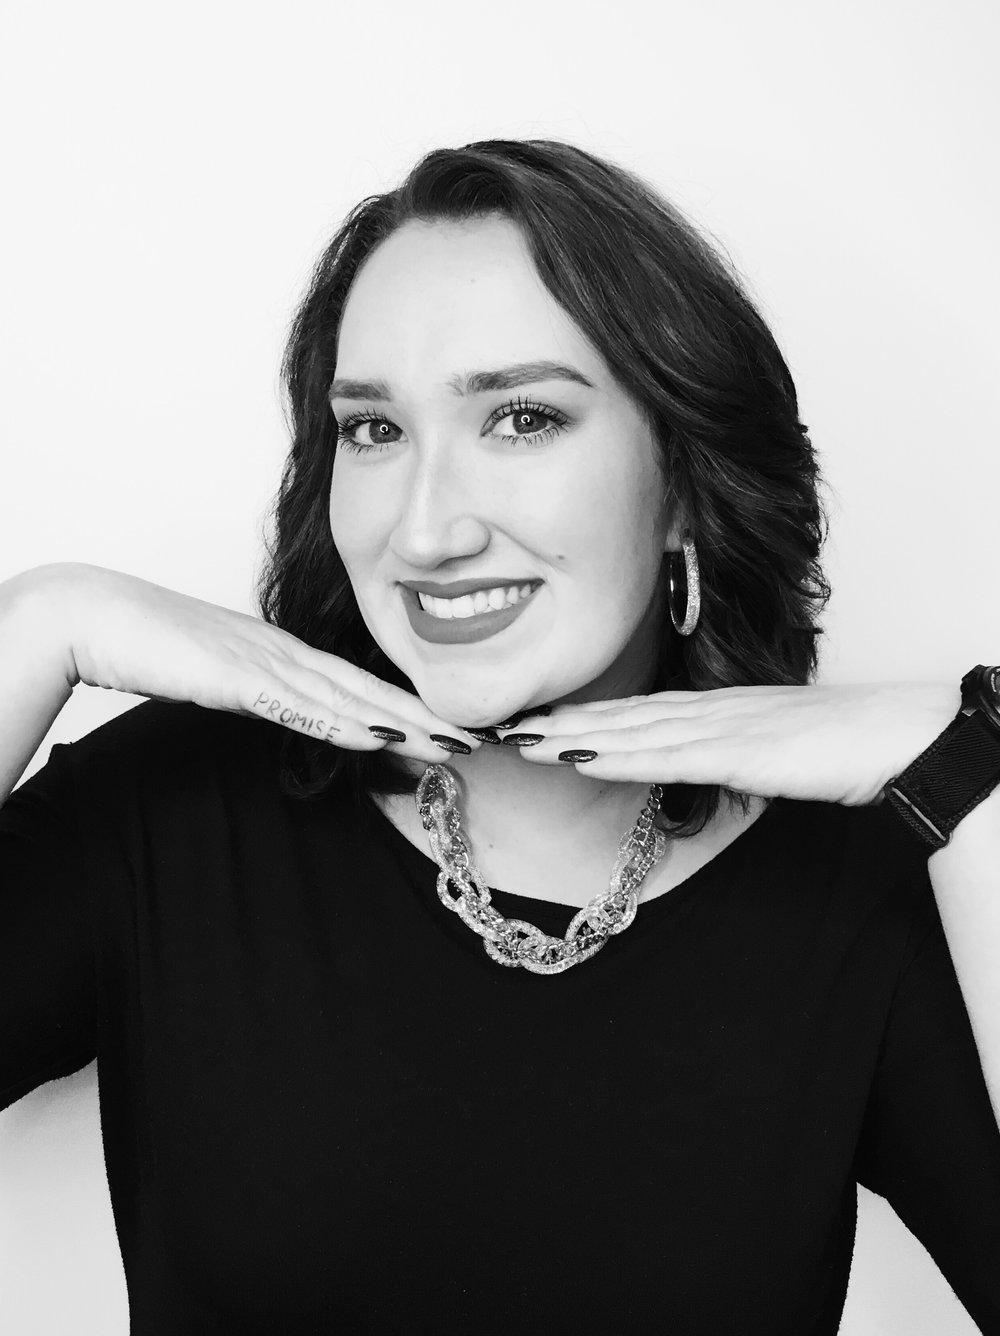 EMILY HUNTSTUDIO STYLIST - Specializes in: updos, braiding, styling